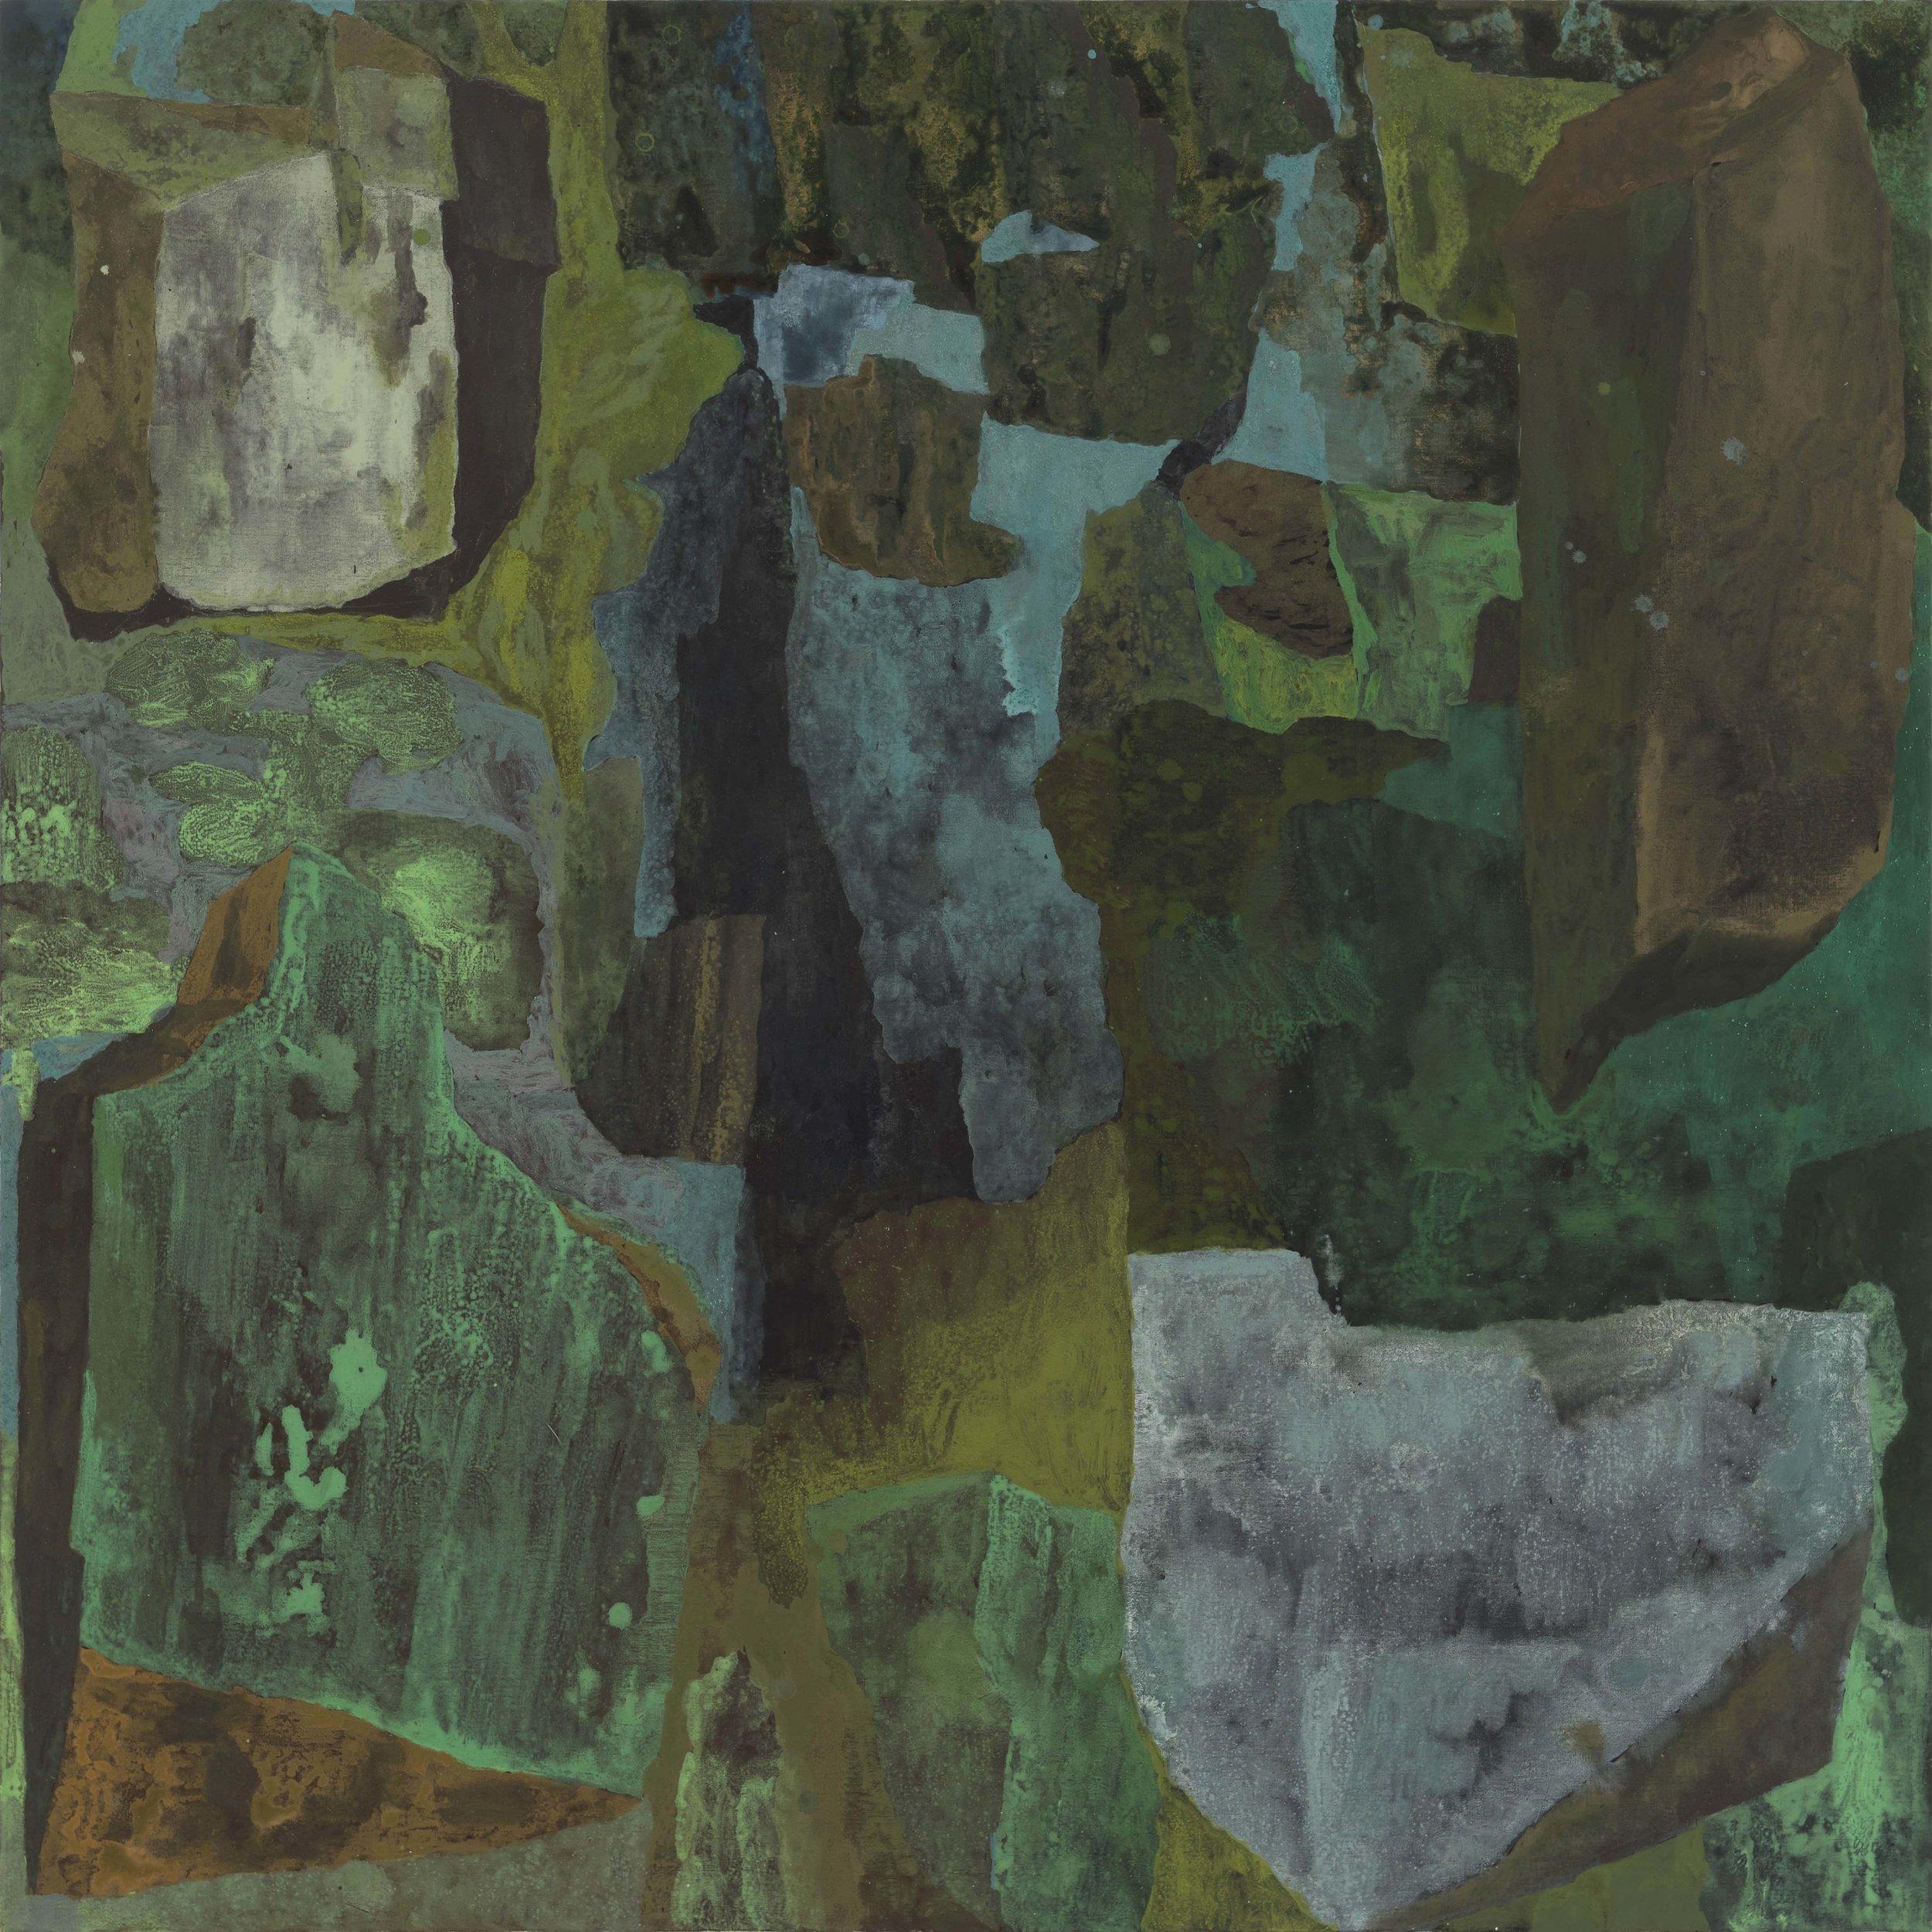 Vegetable, mineral, dark matter. 2017, acrylic on linen. 152 x 152 cm. $9,900